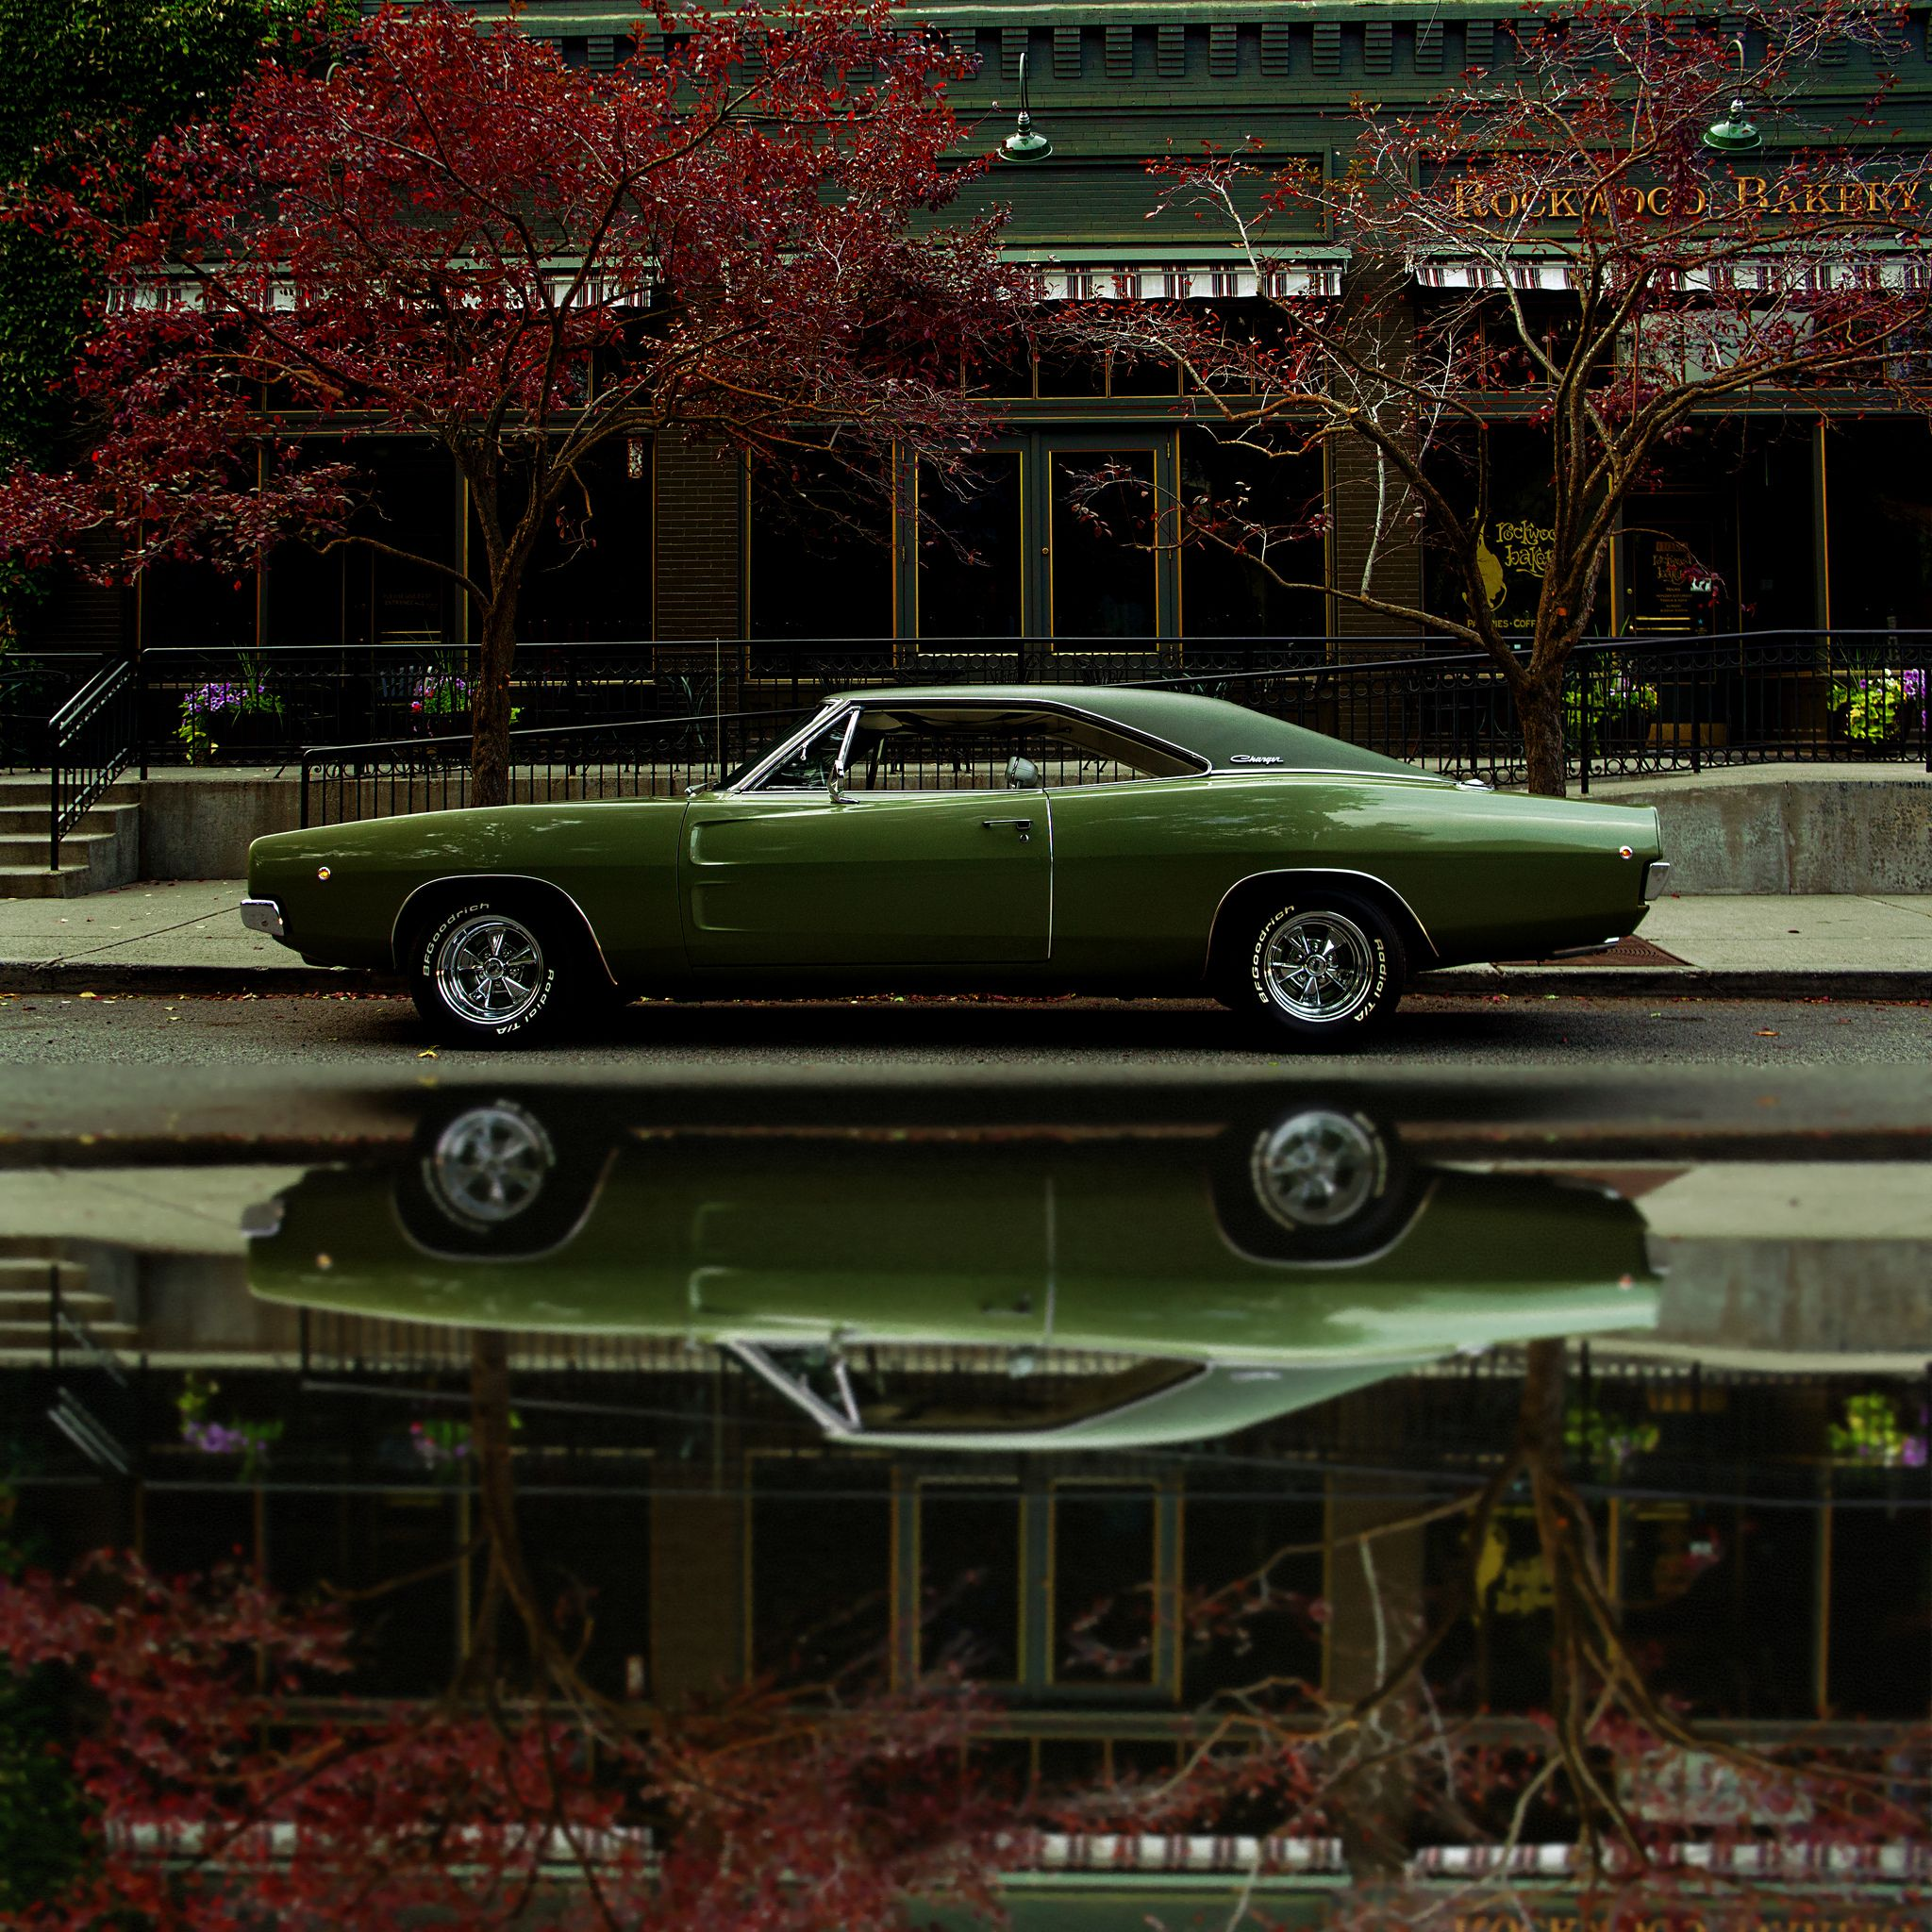 1968 Dodge Charger R/T - Rockwood Bakery (Full Reflection) | Dodge ...